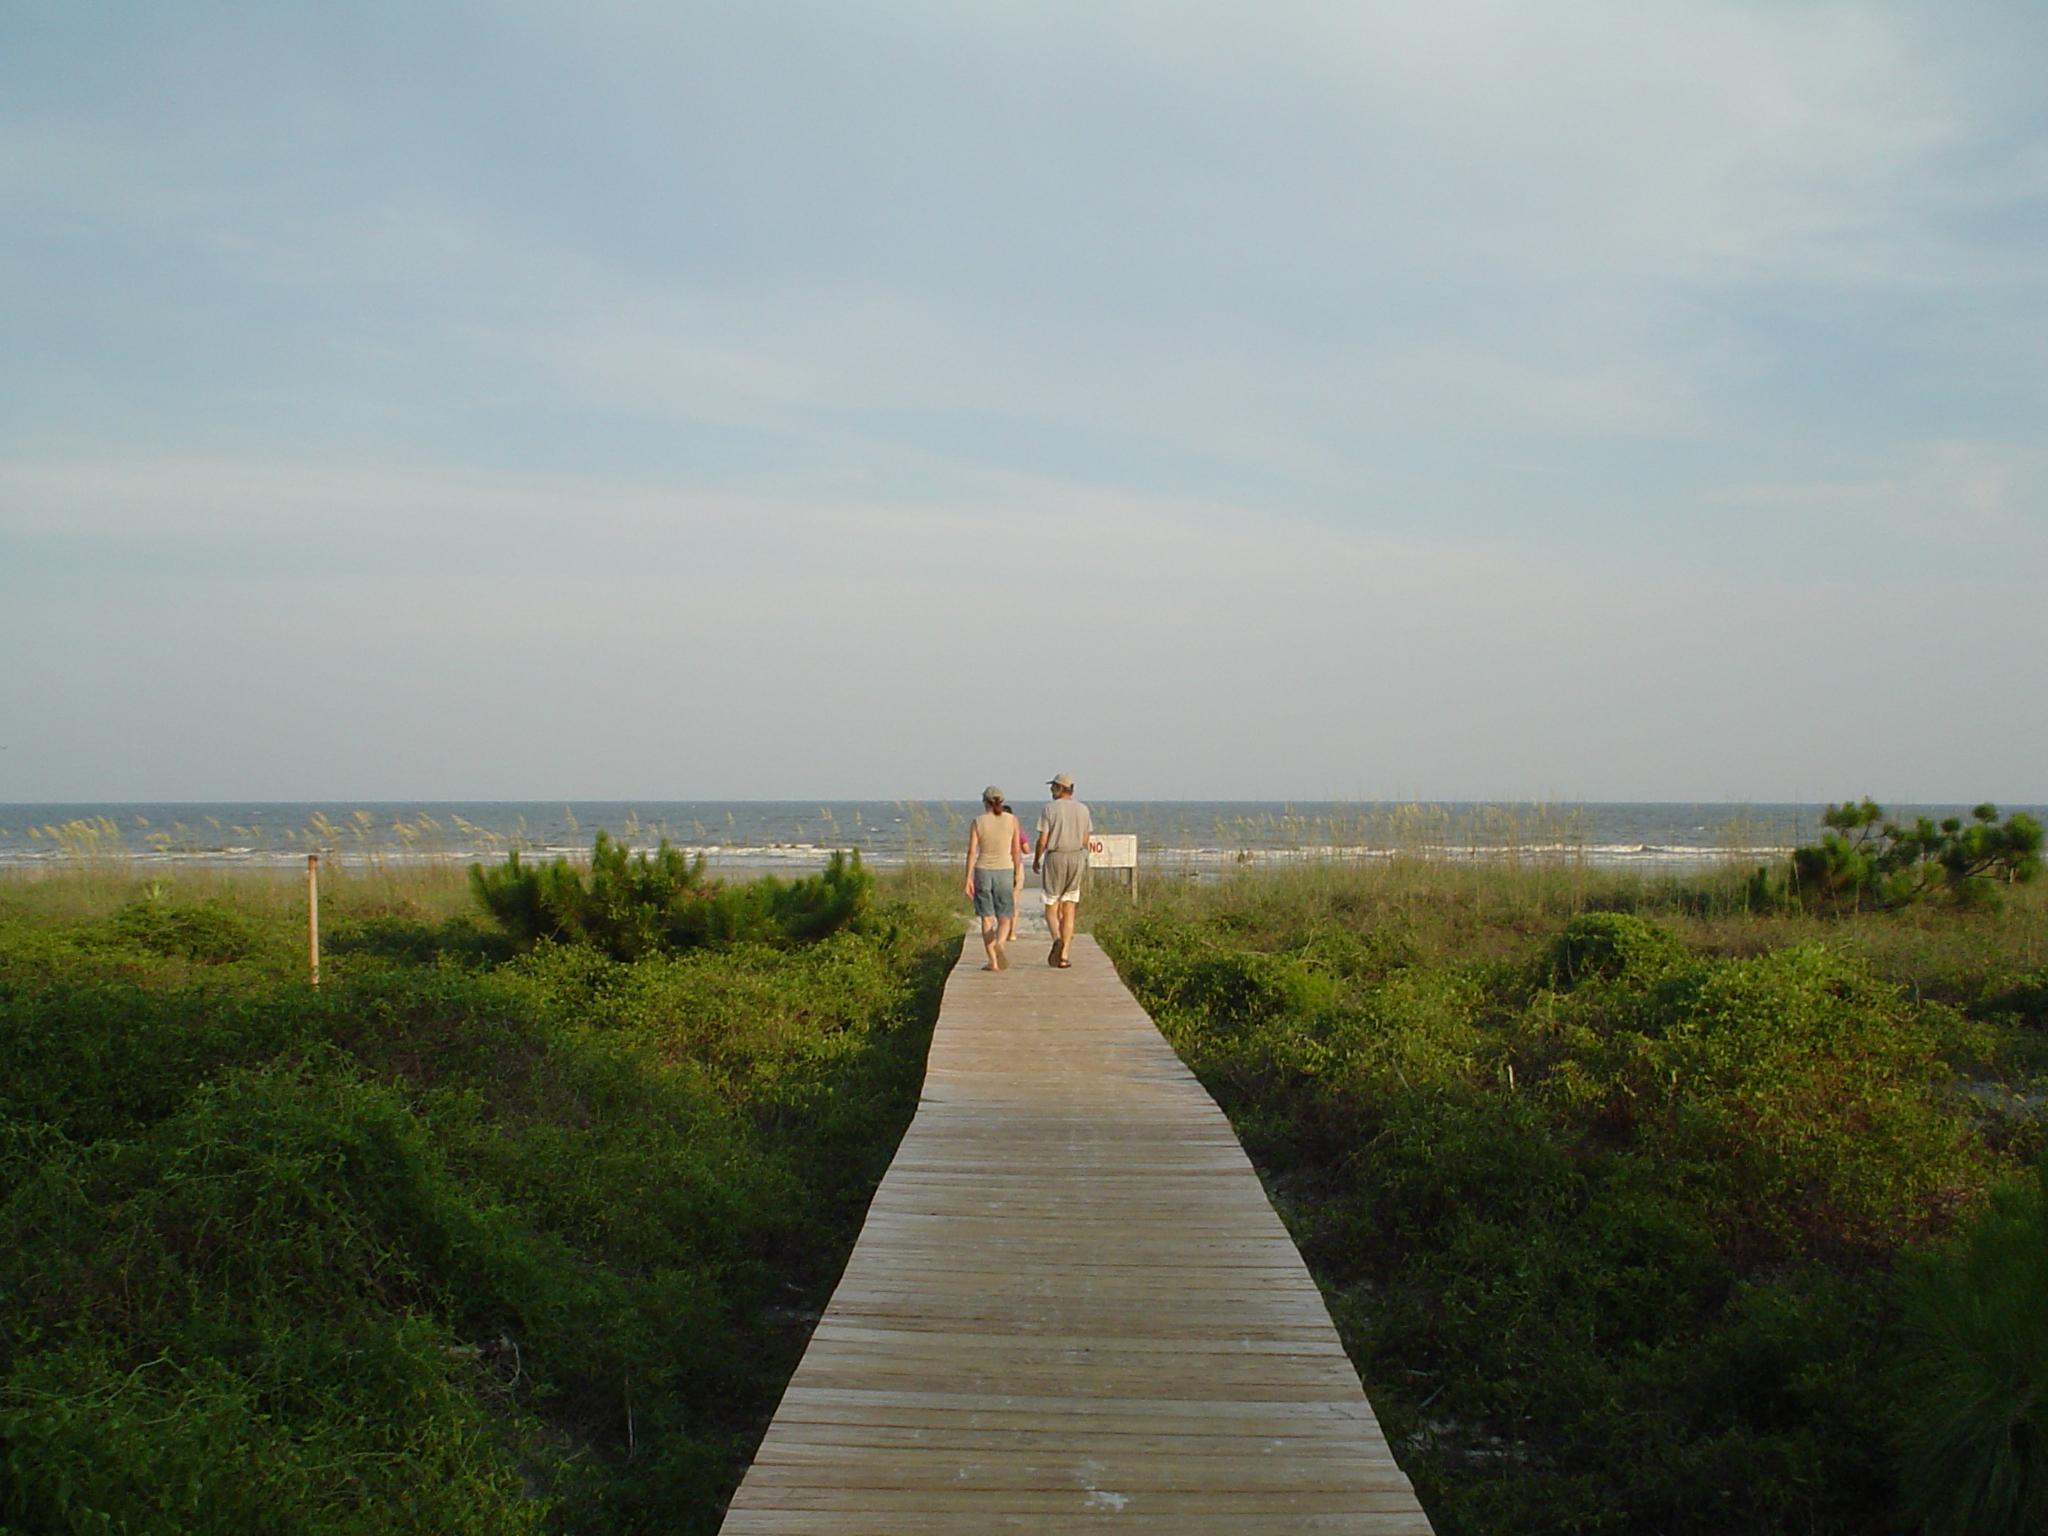 mattsledge - Hilton Head Island, South Carolina